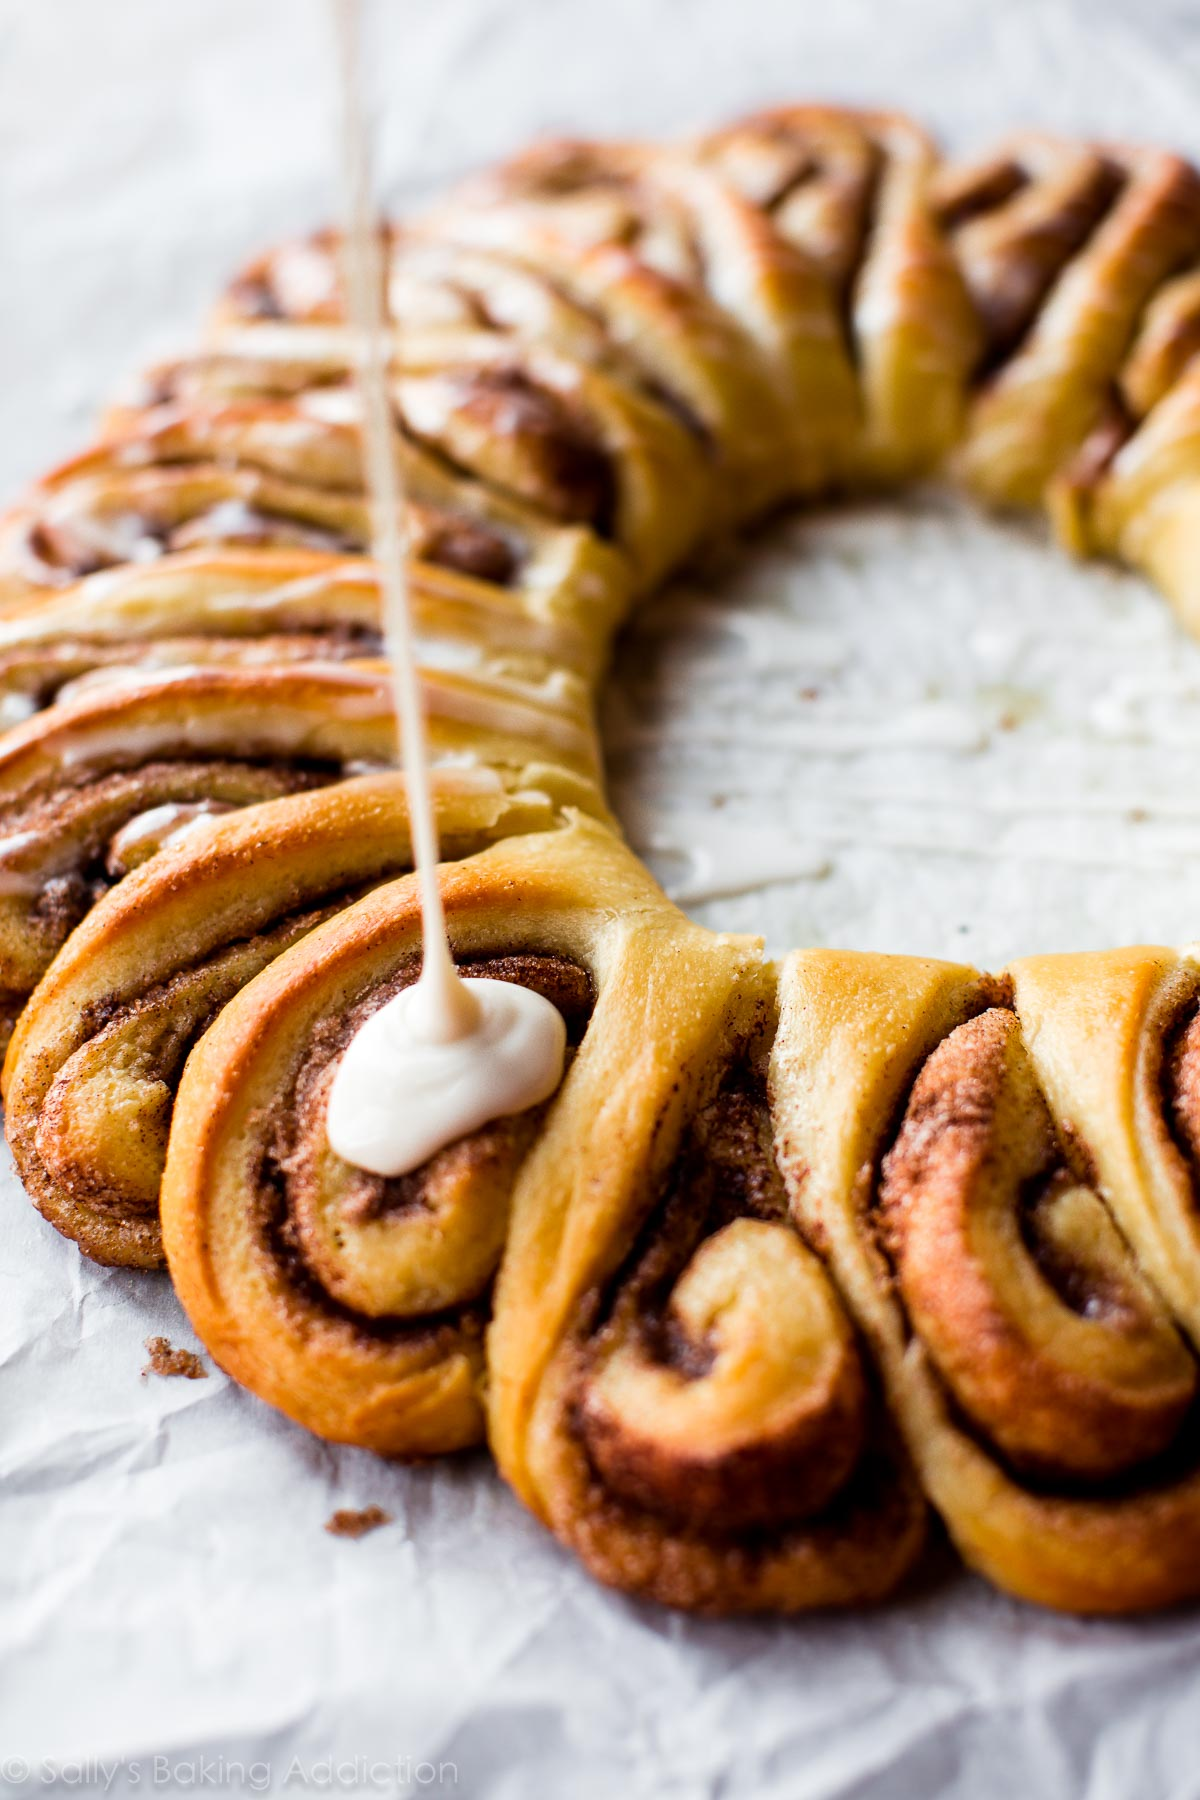 Learn how to make a warm and fluffy, ooey gooey cinnamon roll wreath! Recipe on sallysbakingaddiction.com